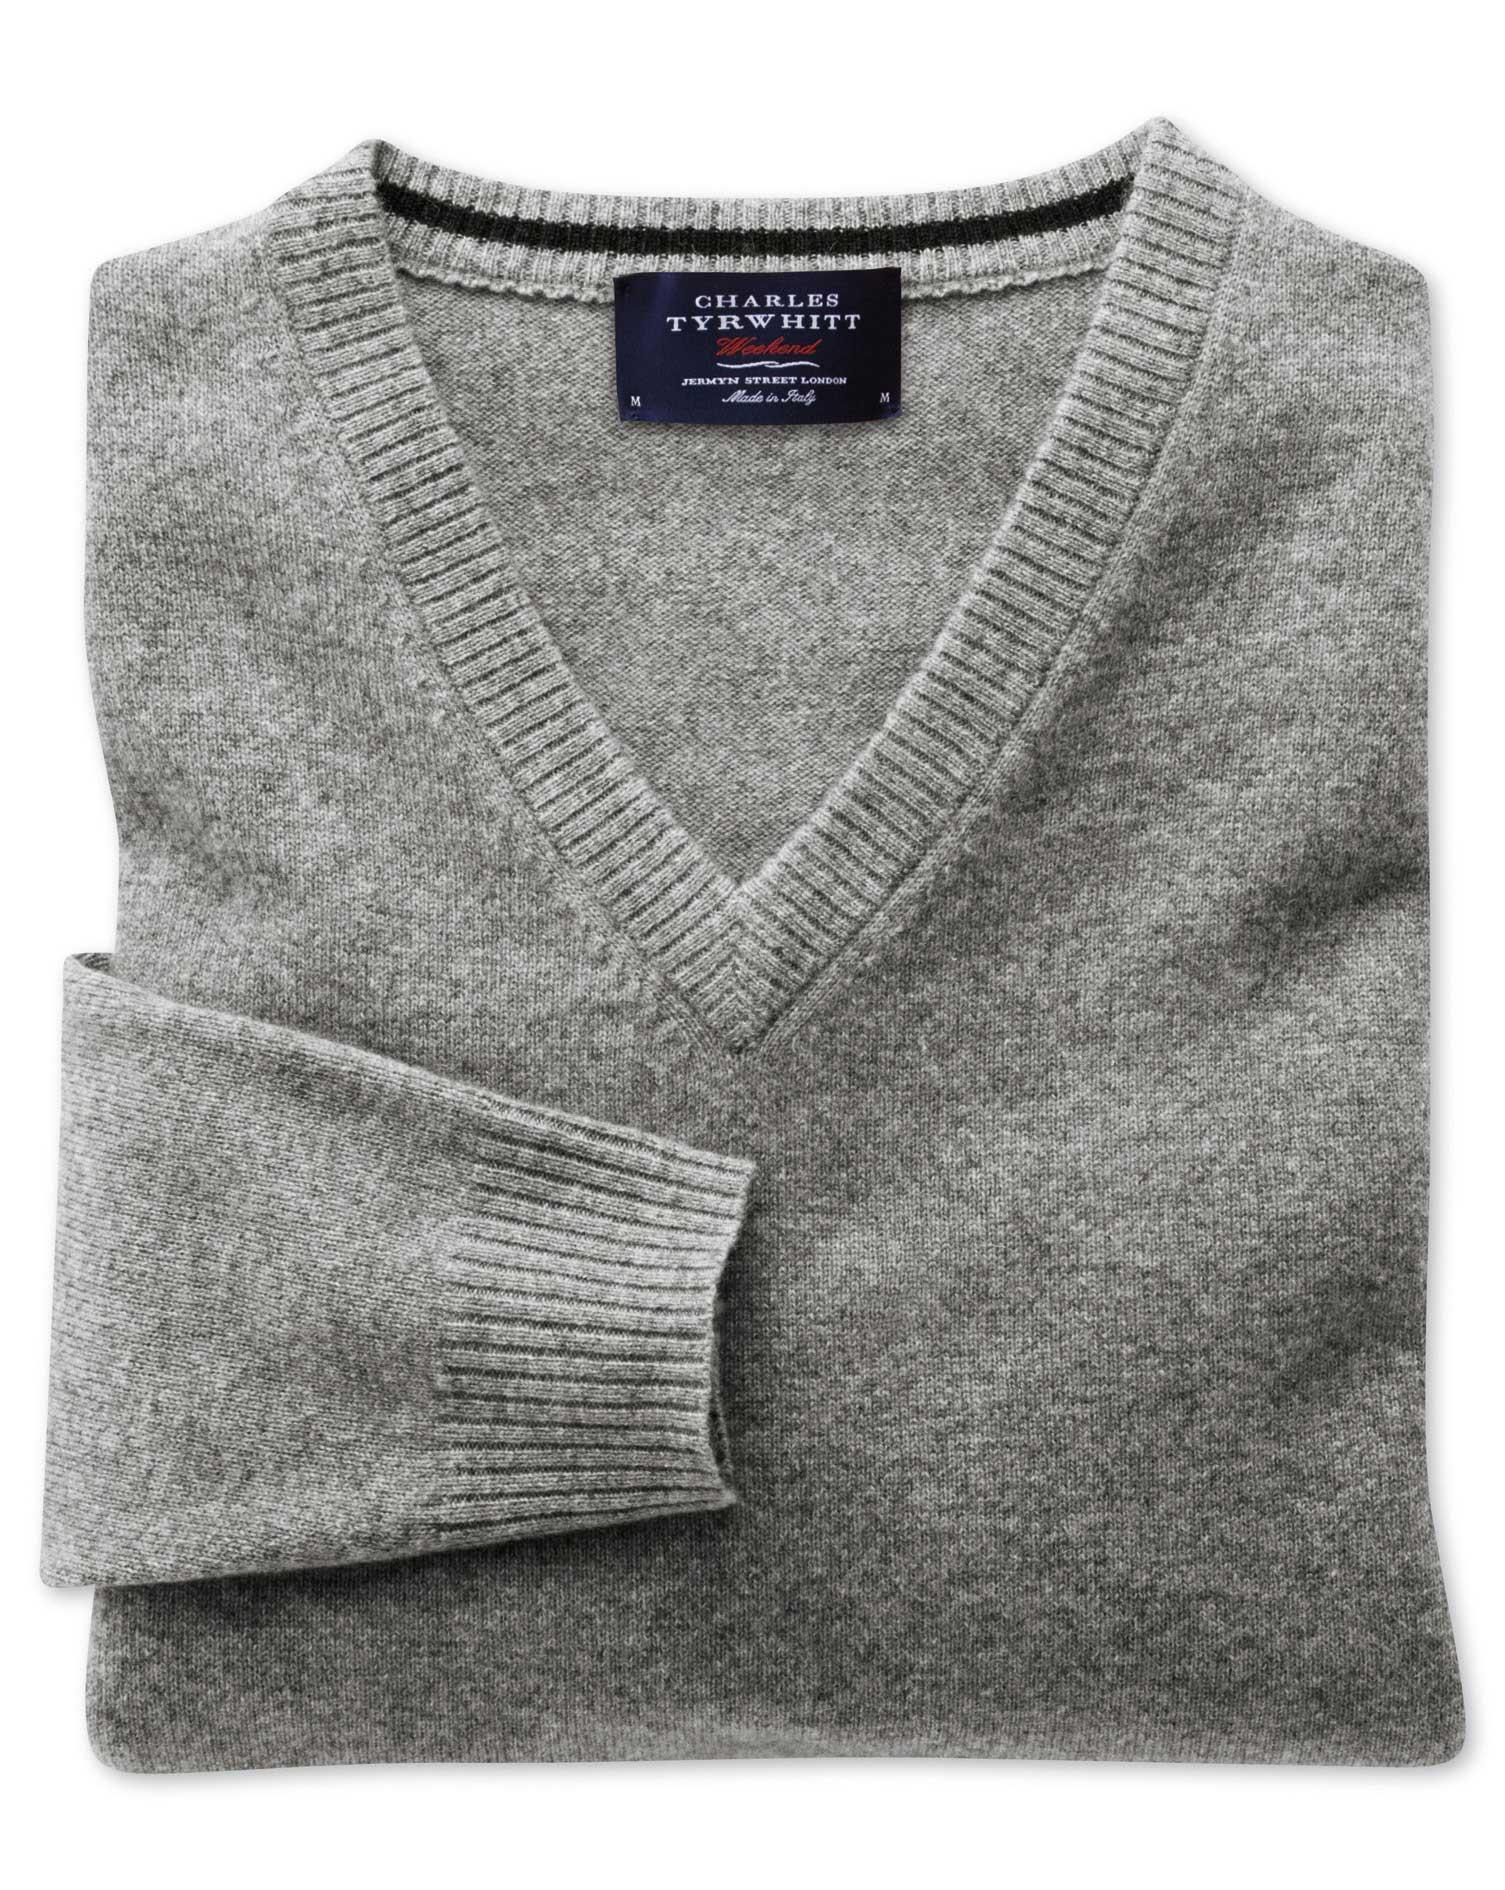 Silver Grey Cashmere V-Neck Jumper Size XS by Charles Tyrwhitt